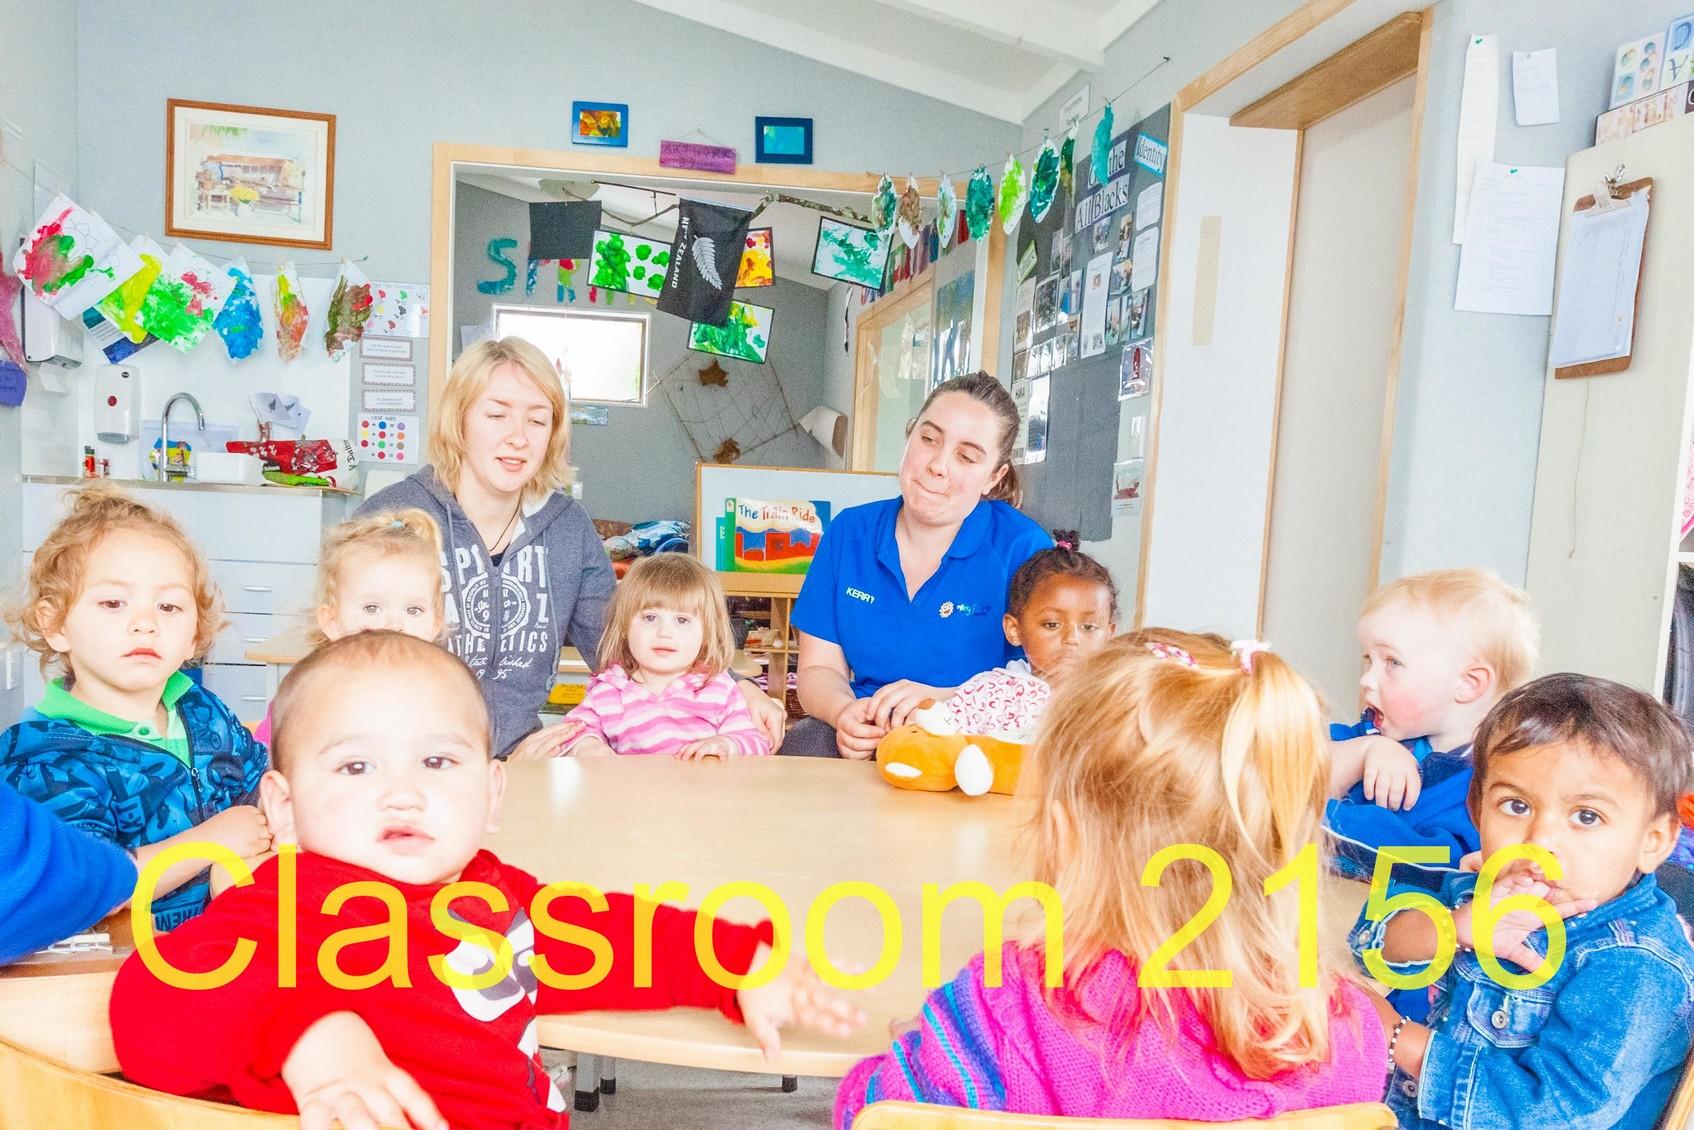 Classroom 2156